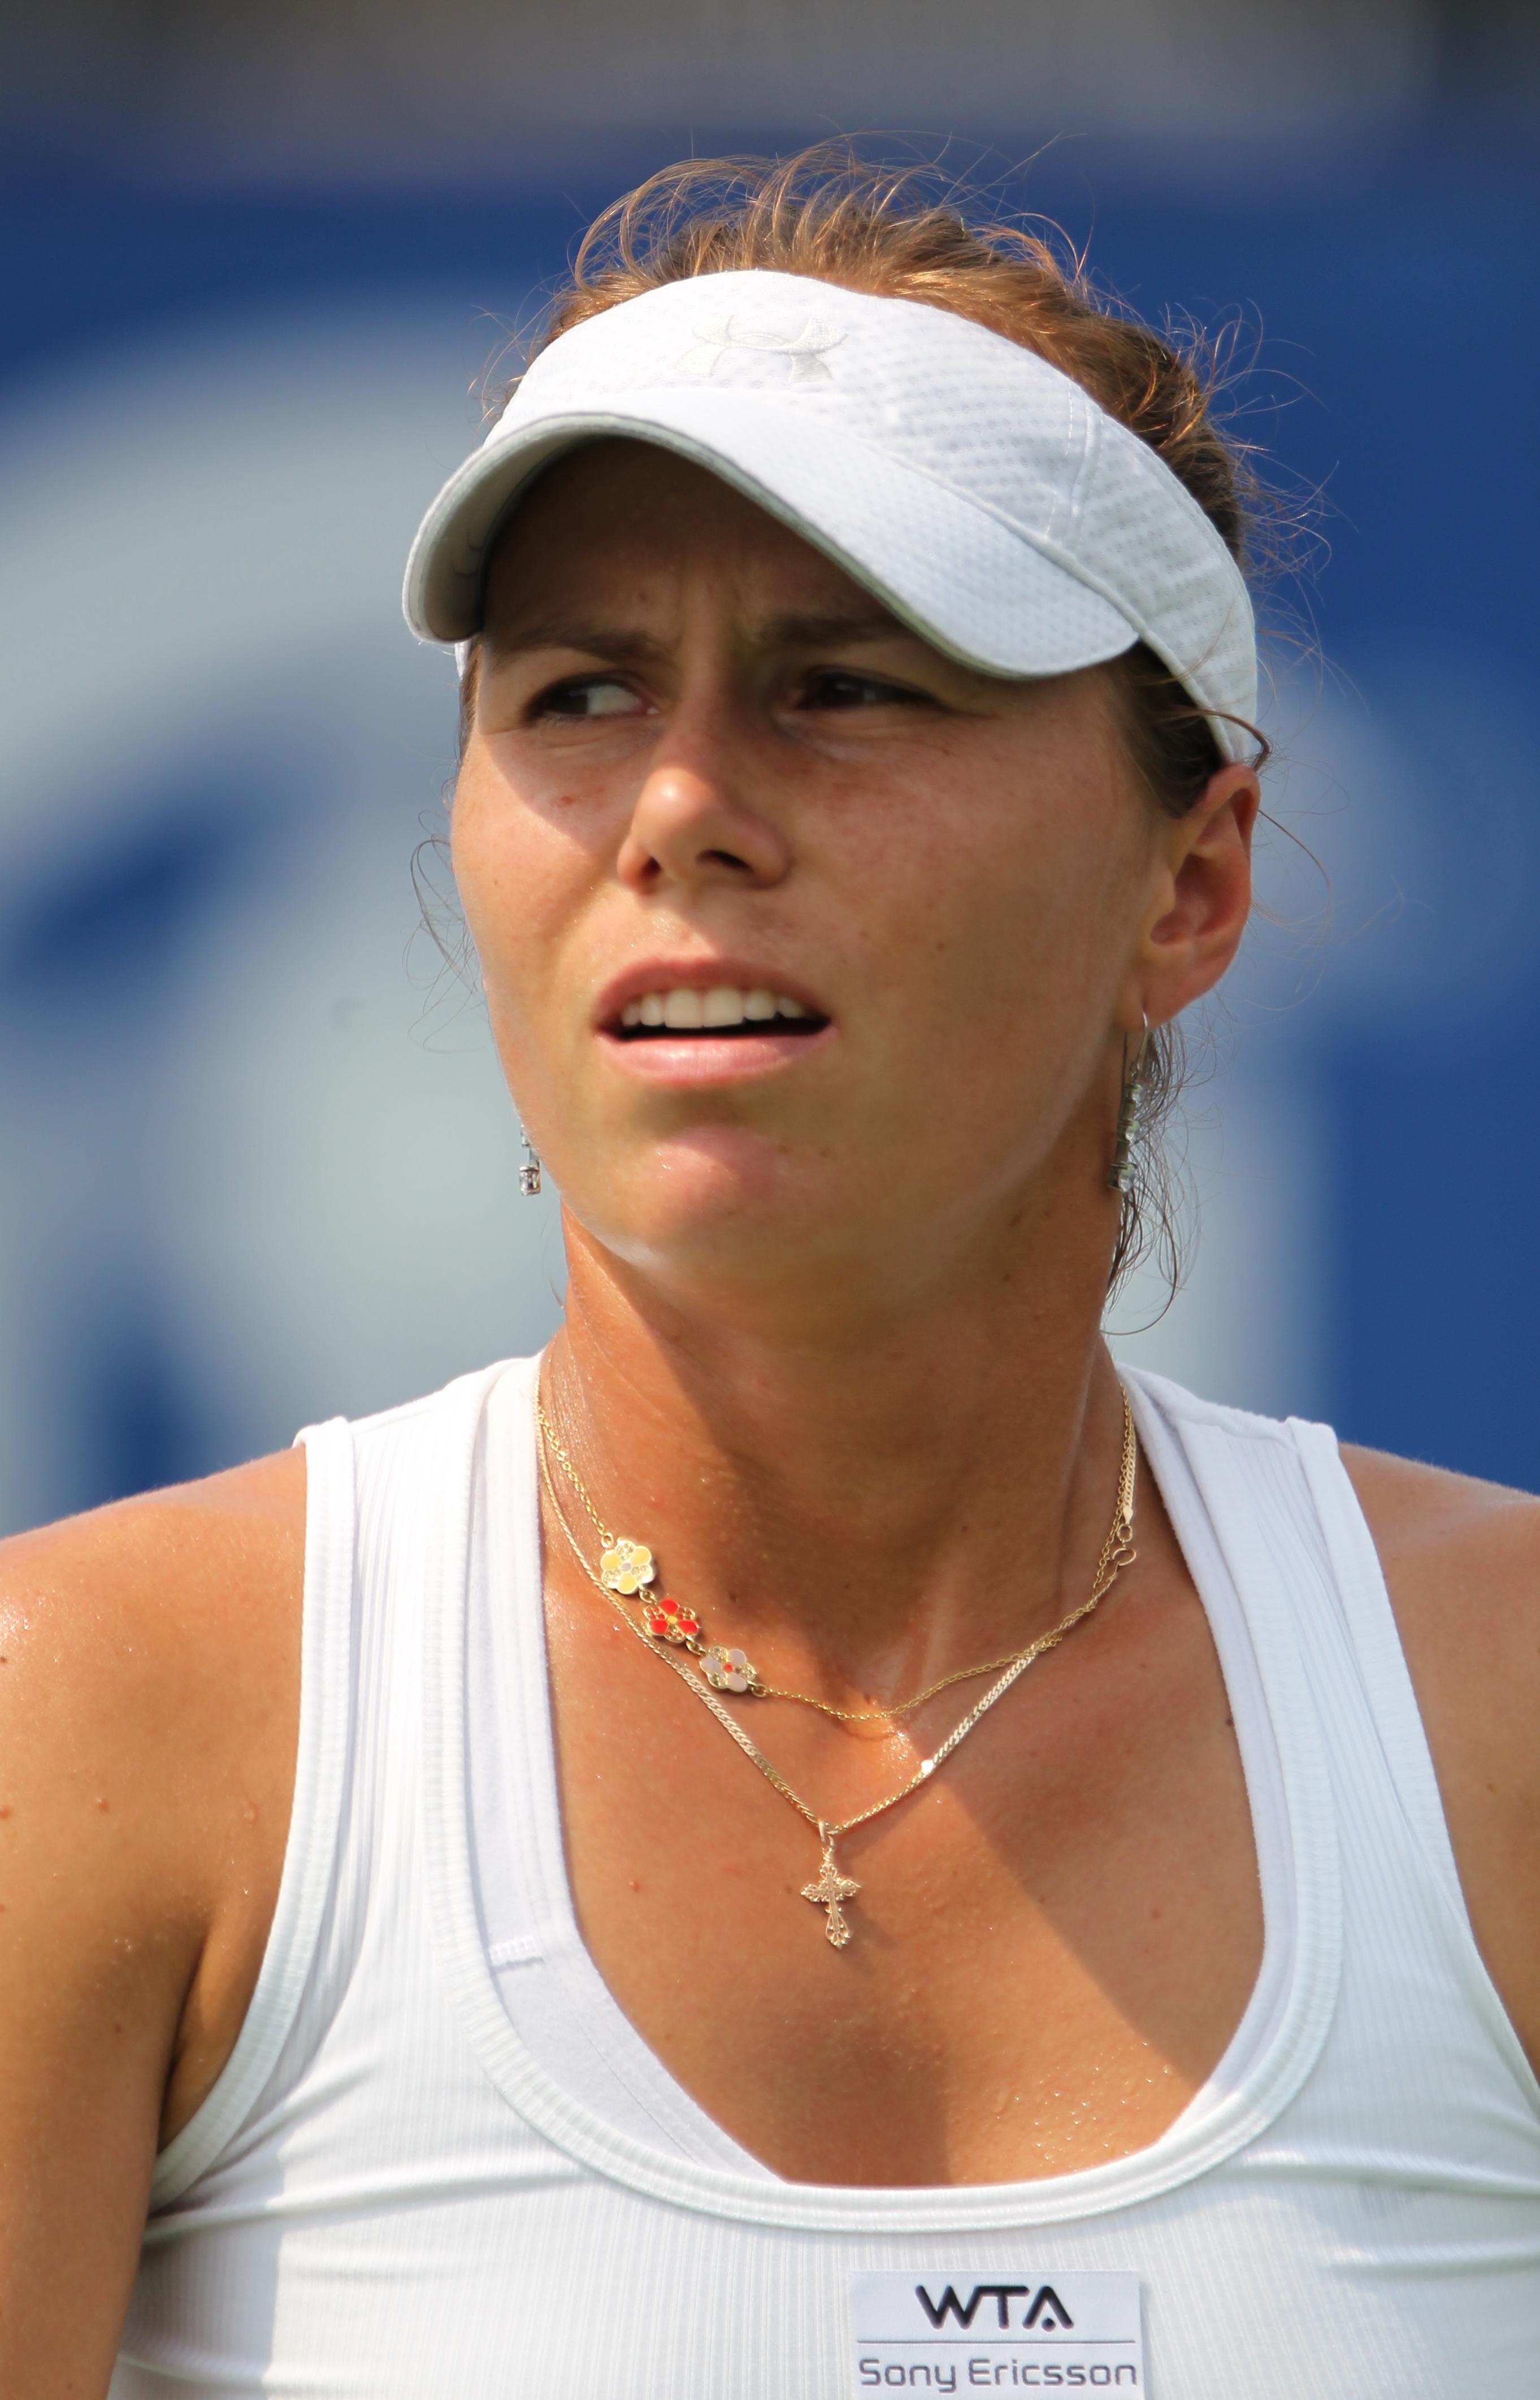 File:Varvara Lepchenko (5986163073).jpg - Wikimedia Commons Varvara Lepchenko Tennis